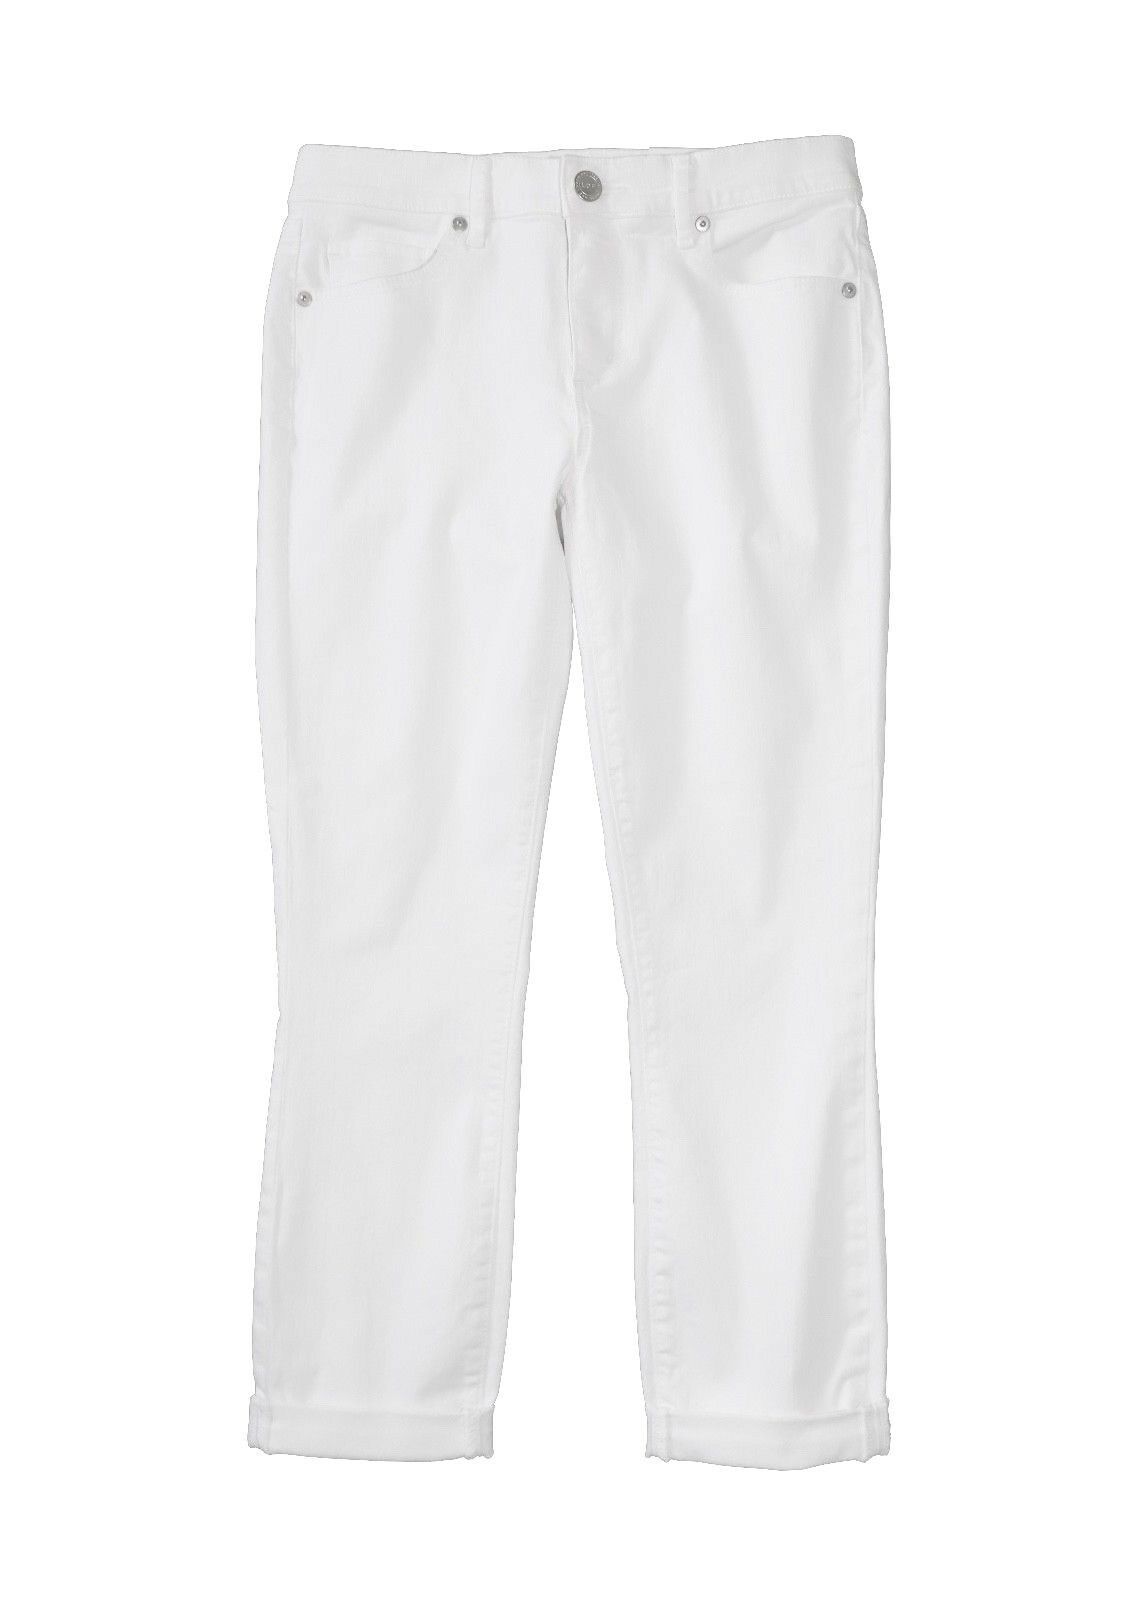 LOFT Women's - NWT - Modern Skinny Fit Crisp White Denim Roll Cuff Crop Jeans